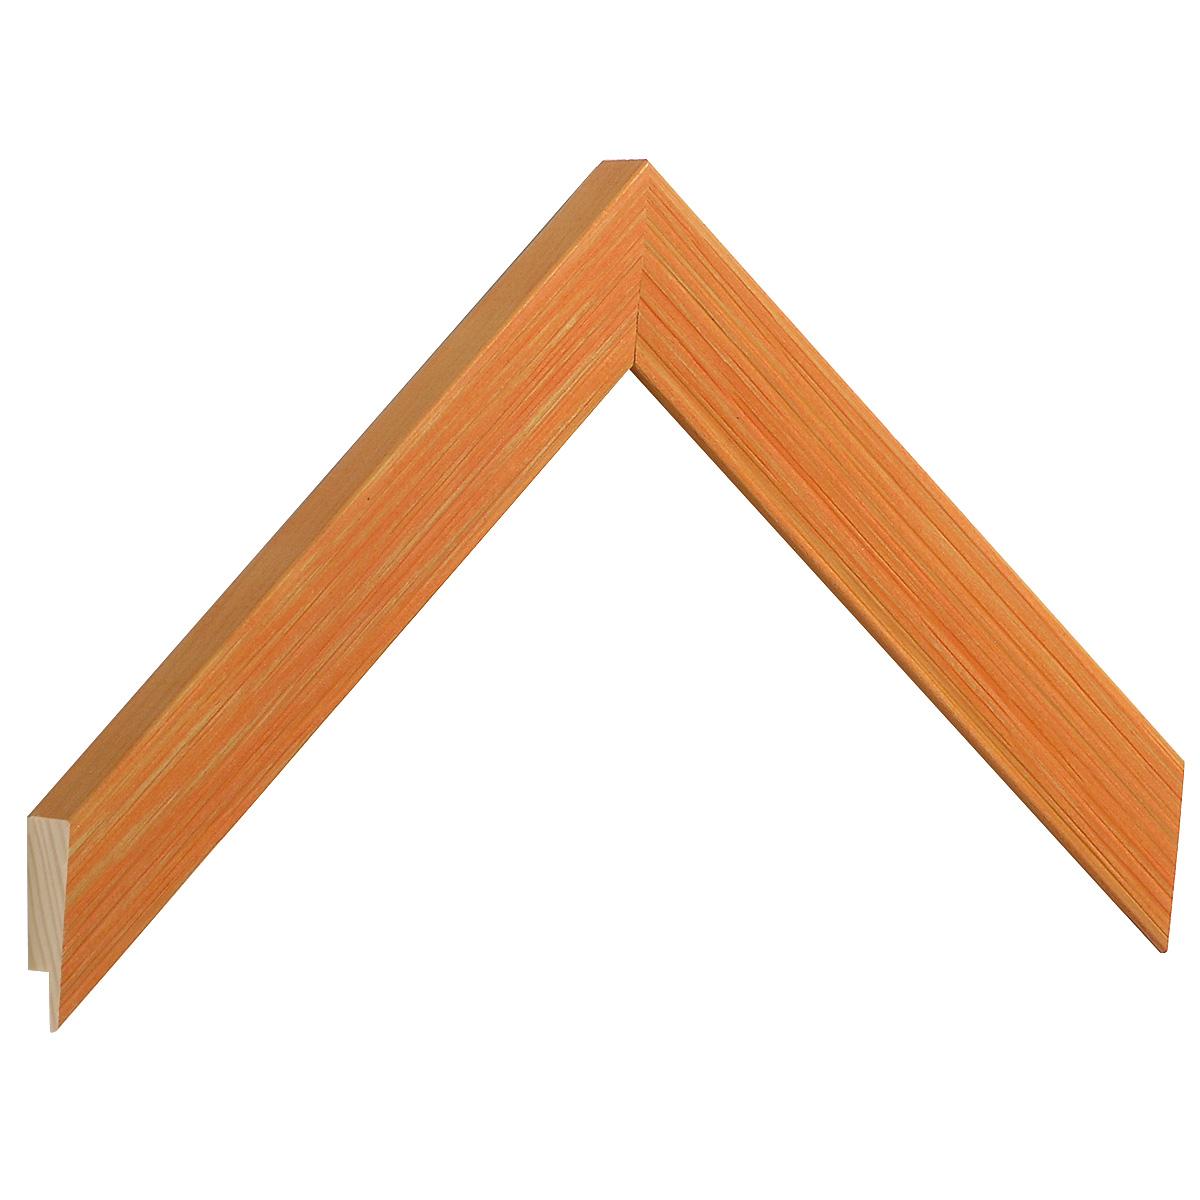 Moulding fir, width 24mm, height 018, striated - orange